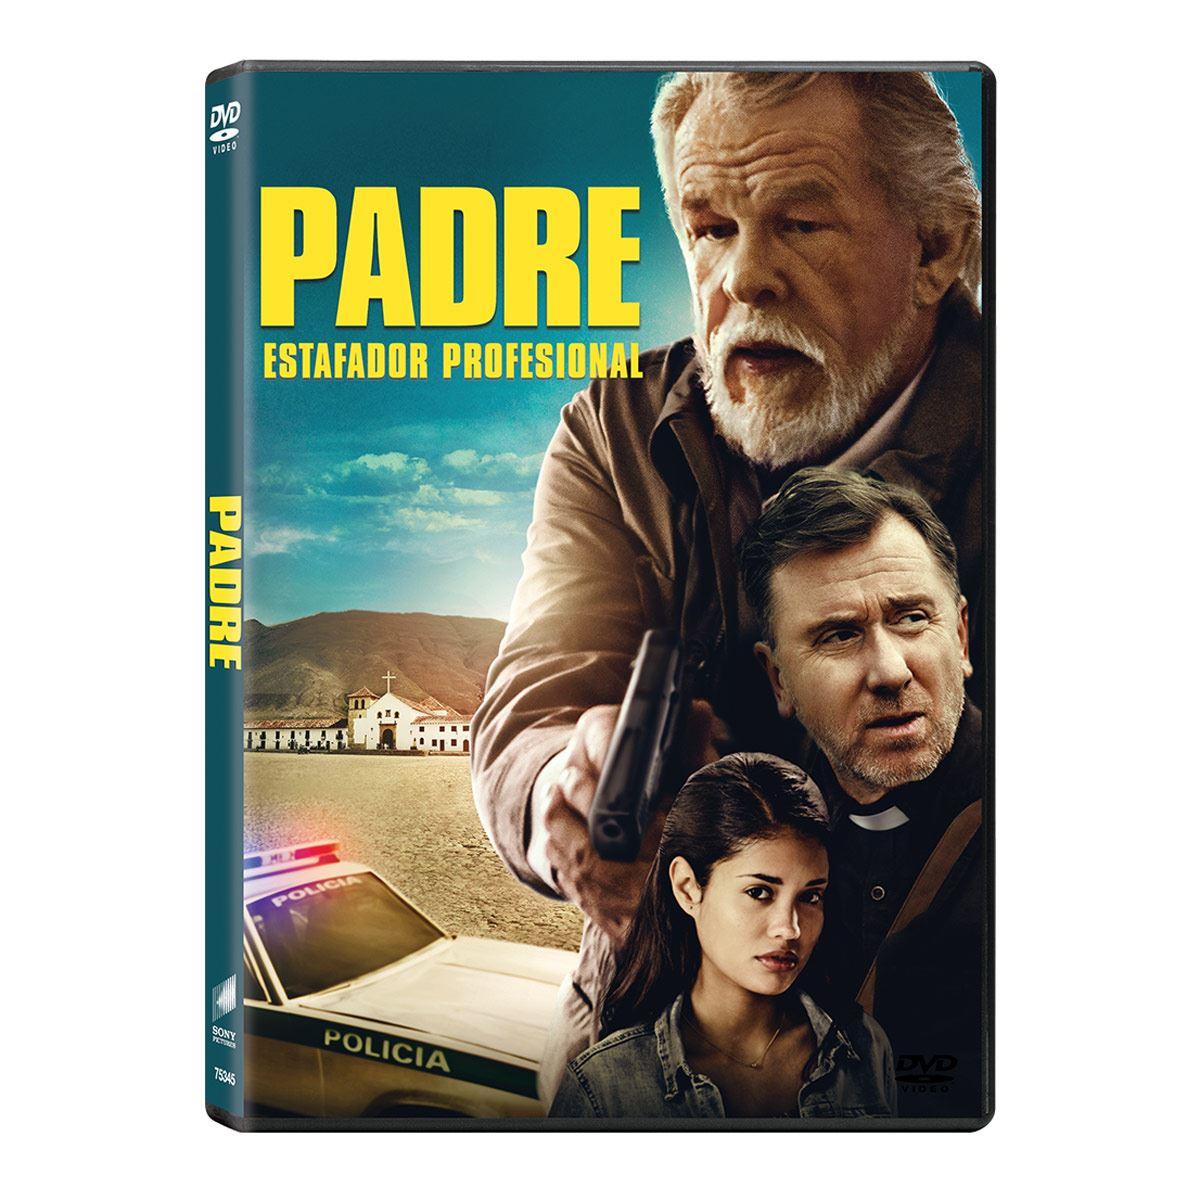 DVD Padre Estafador Profesional